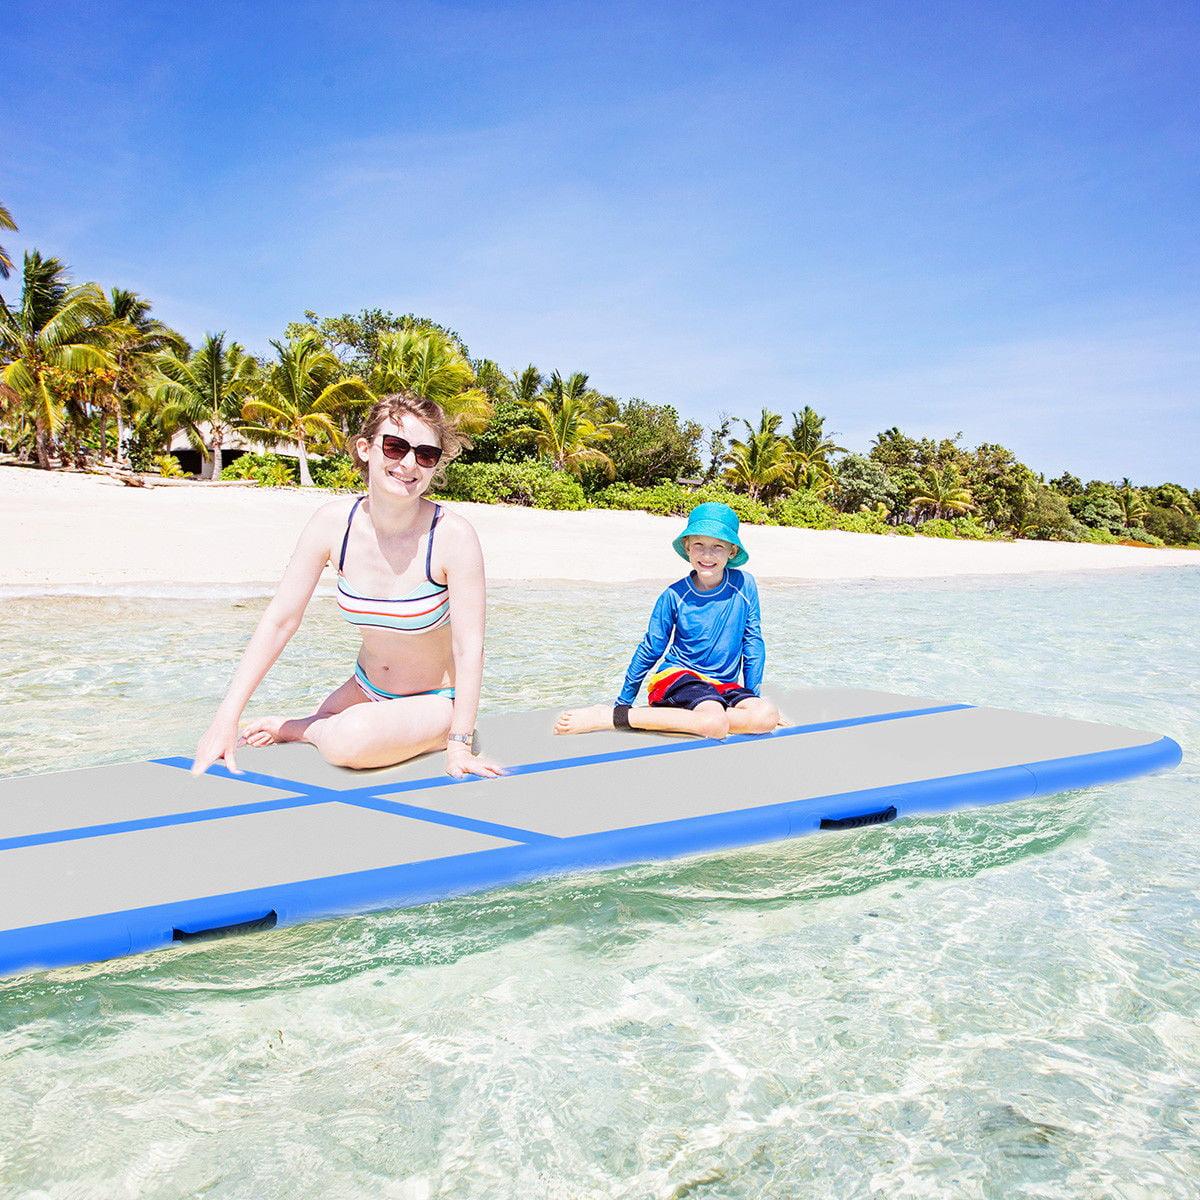 Goplus 10' Inflatable Gymnastics Mat Air Track Floor Mats Water Buoyancy with Pump Blue